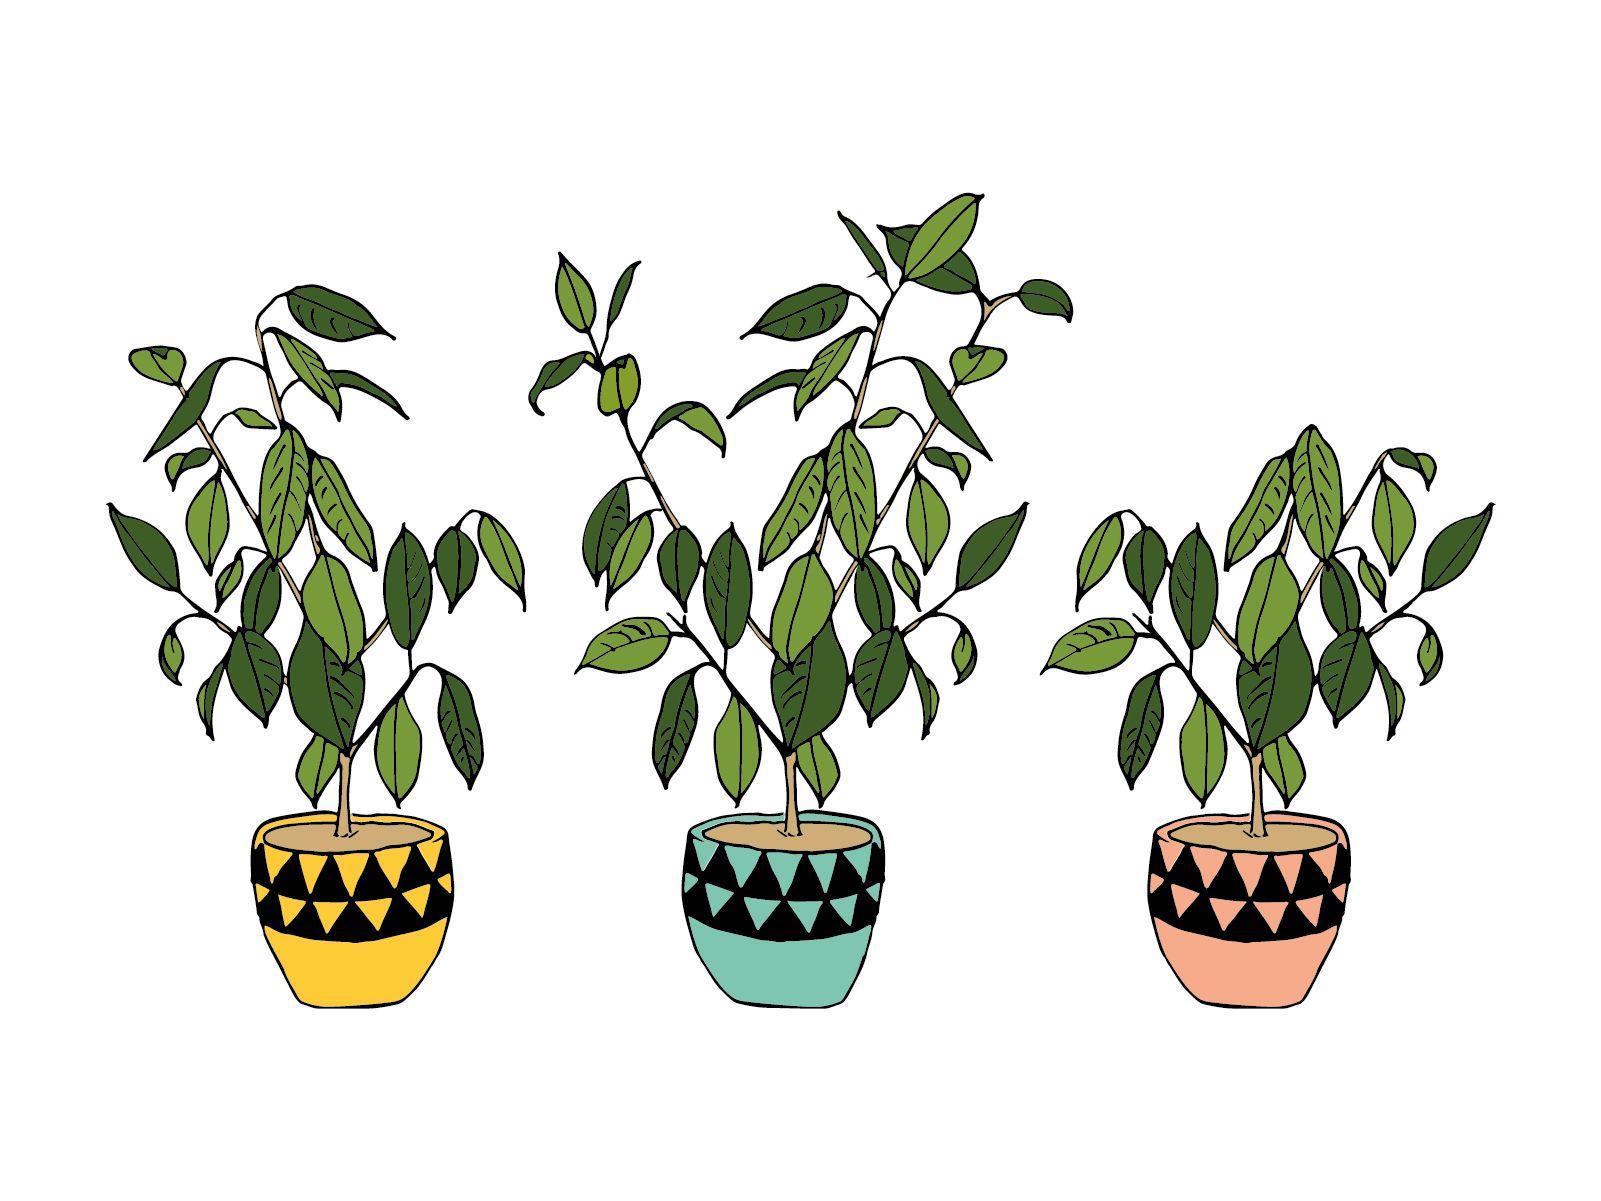 Plant Aesthetic Desktop Wallpapers Top Free Plant Aesthetic Desktop Backgrounds Wallpaperaccess